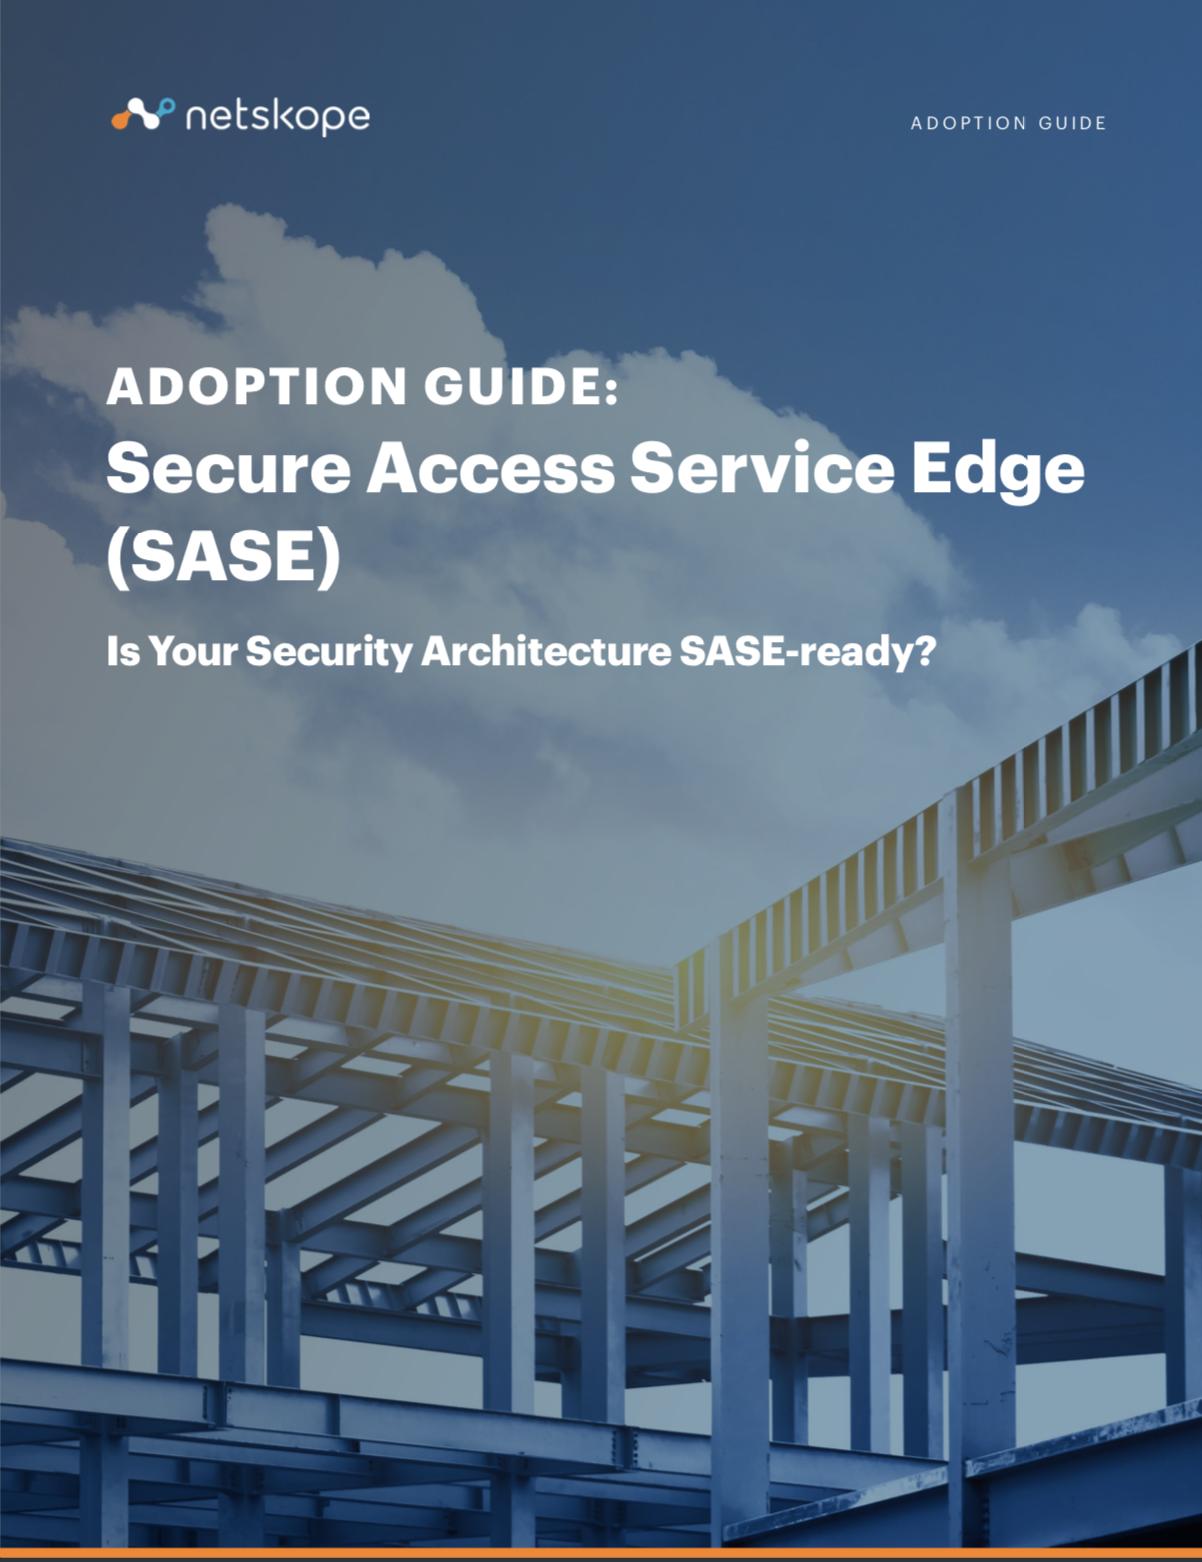 Netskope Adoption Guide for SASE